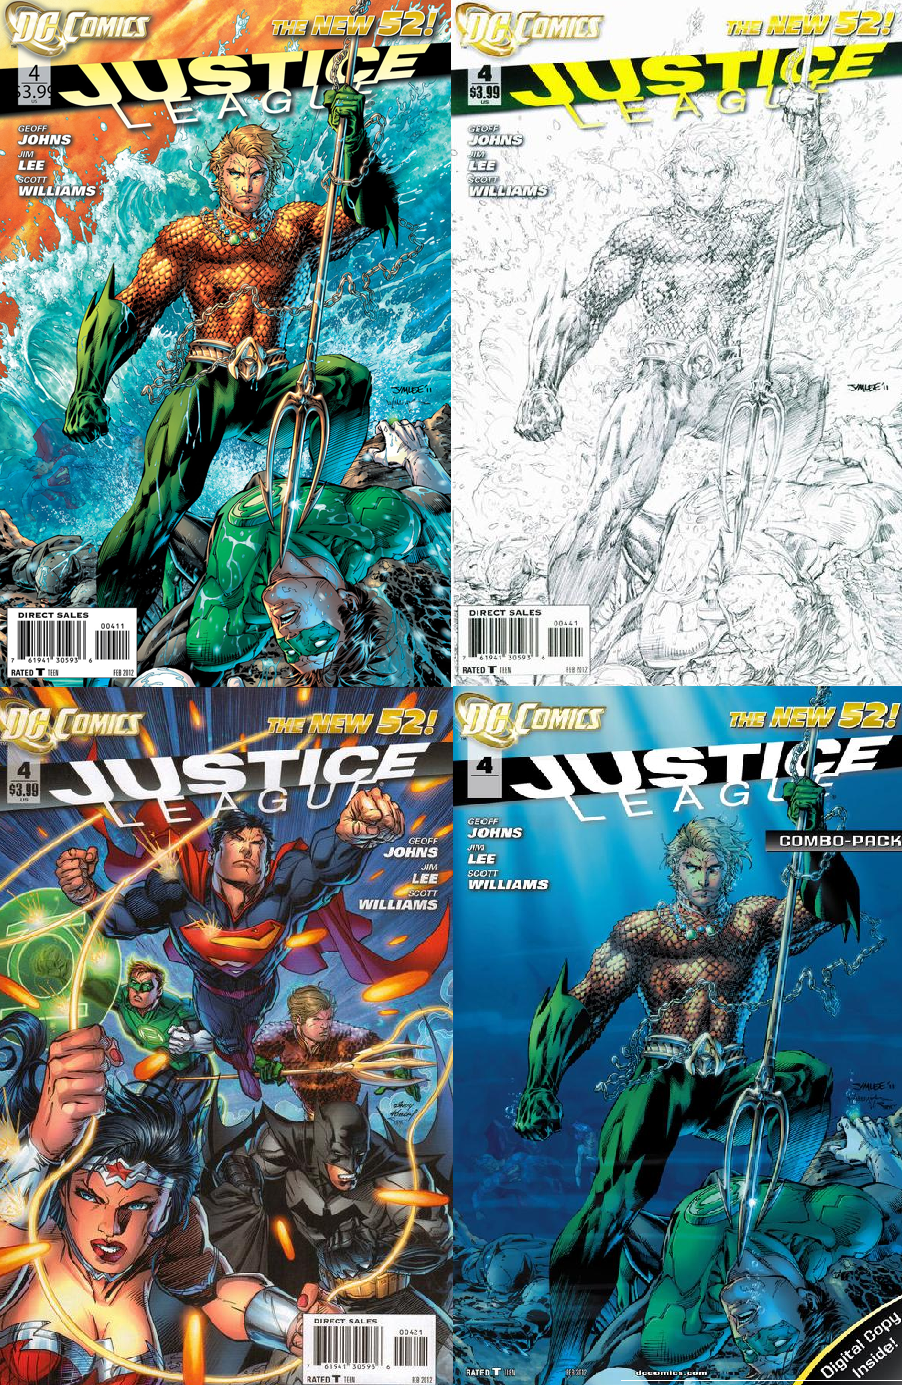 Epic justice attacks - 2 5